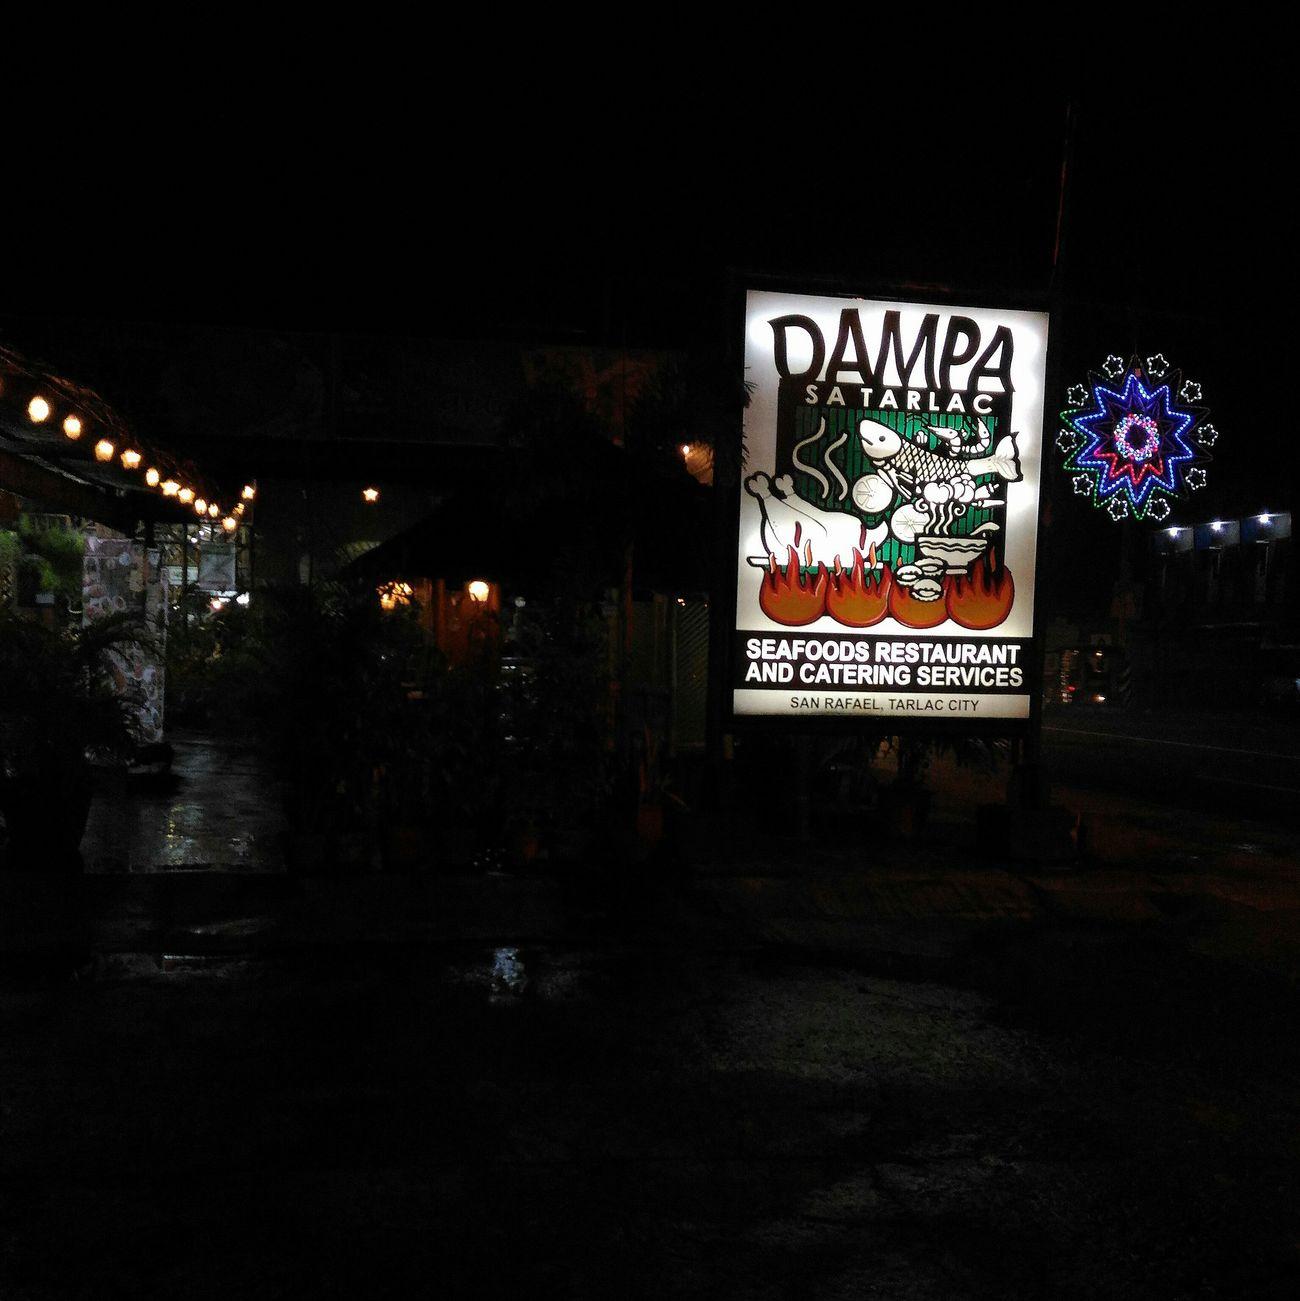 Illuminated No People Night Outdoors Dampa Tarlac, Philippines Philippines Restaurants Restaurant Entrance Restaurant Exterior Lights Night Photography Illuminations Seafoods SEAFOOD🐡